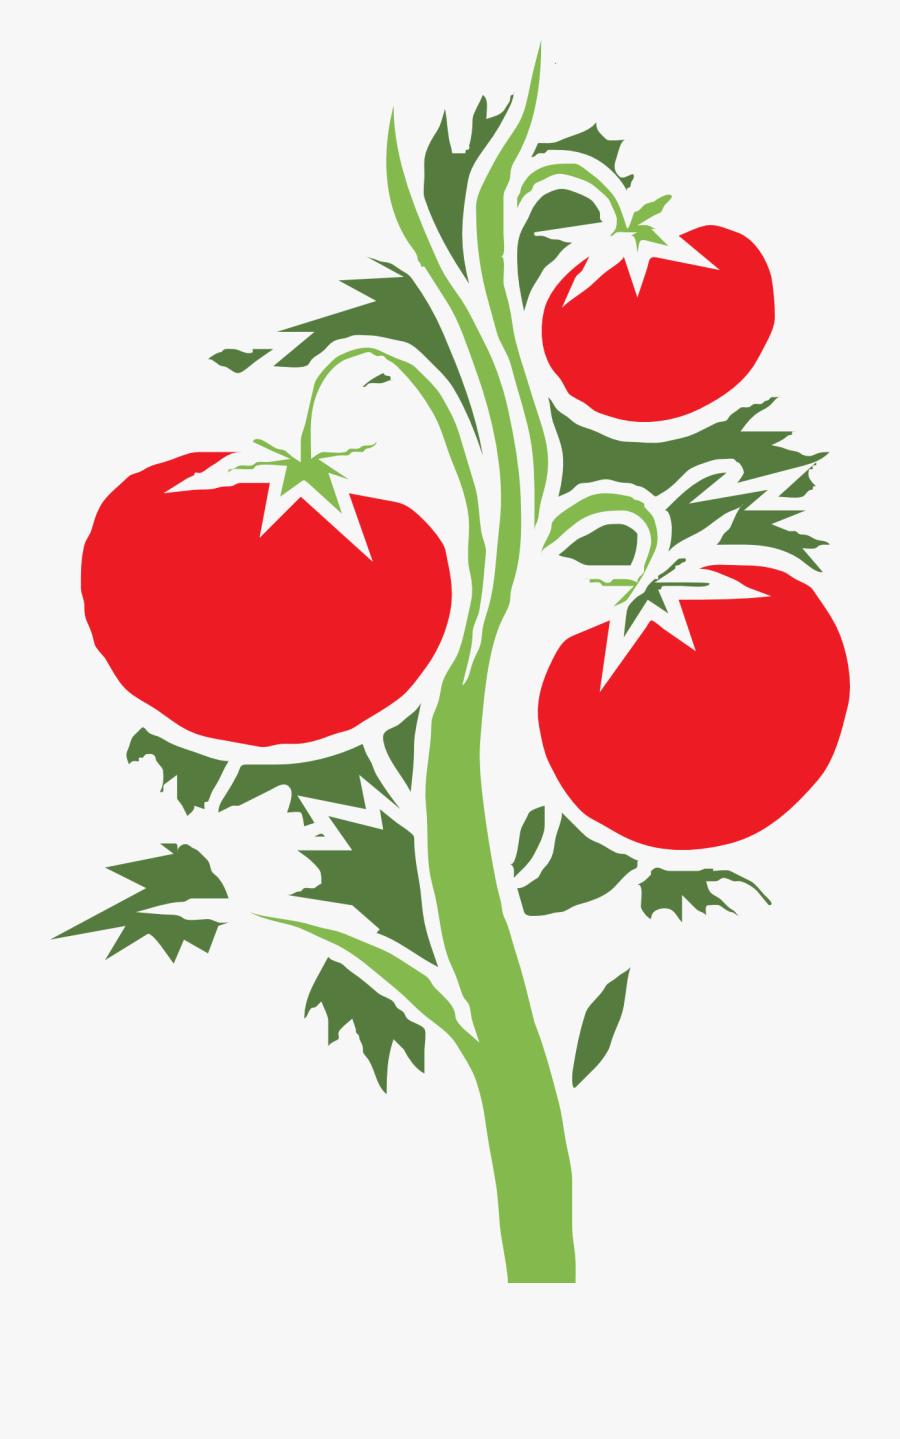 Cherry Tomato Clip Art - Tomato Plant Clipart Png, Transparent Clipart